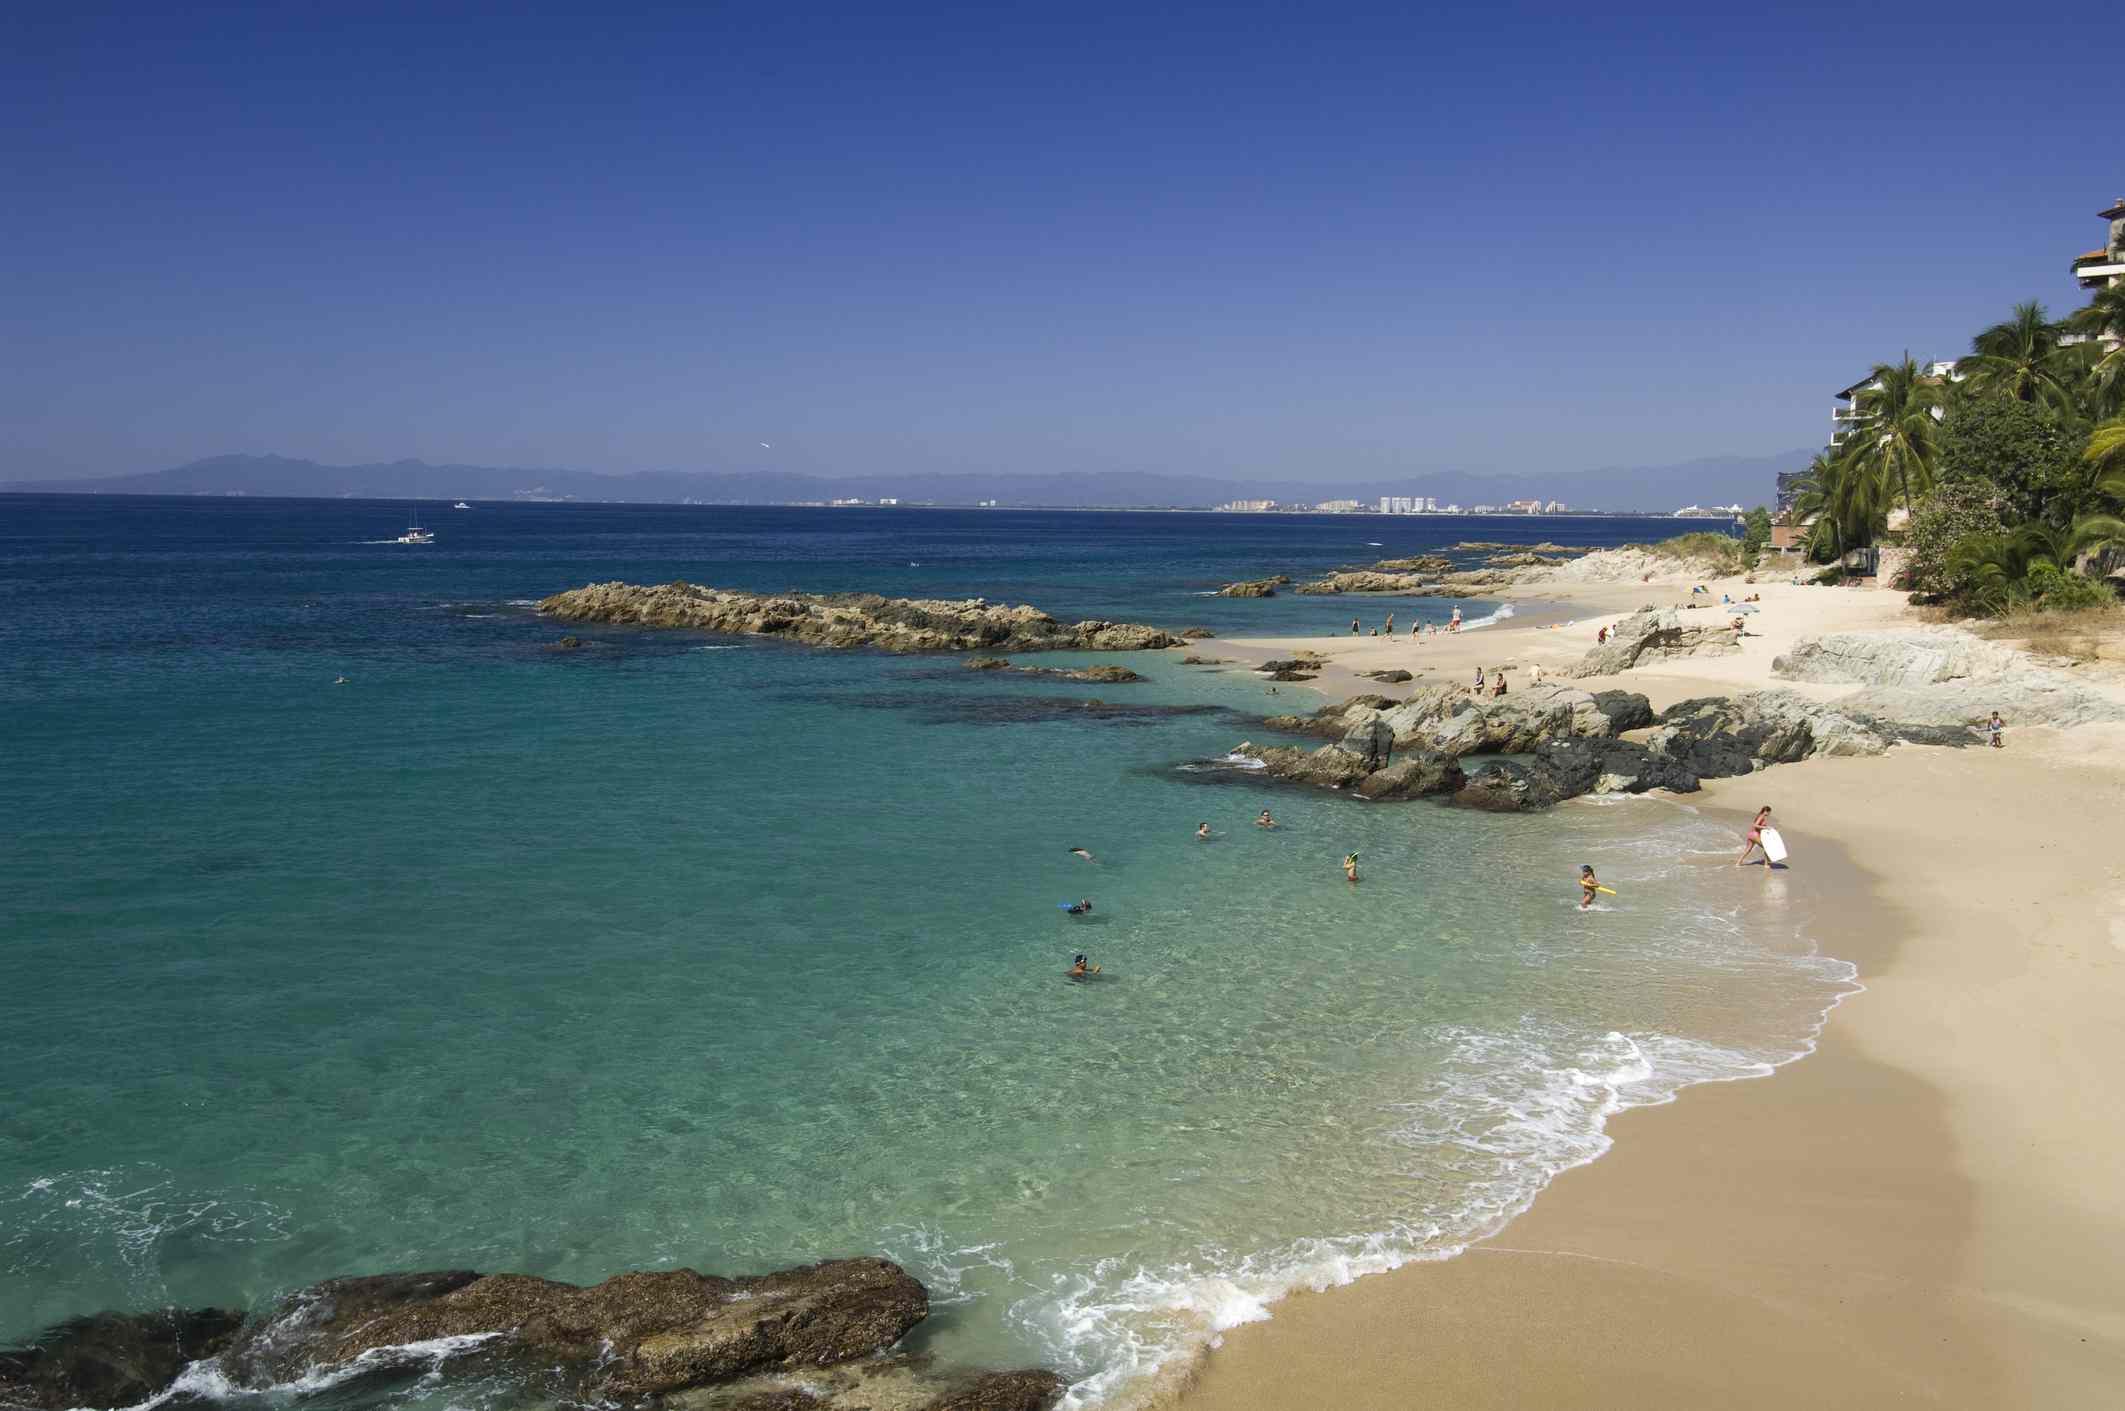 Playa Conchas Chinas Beach in Puerto Vallarta